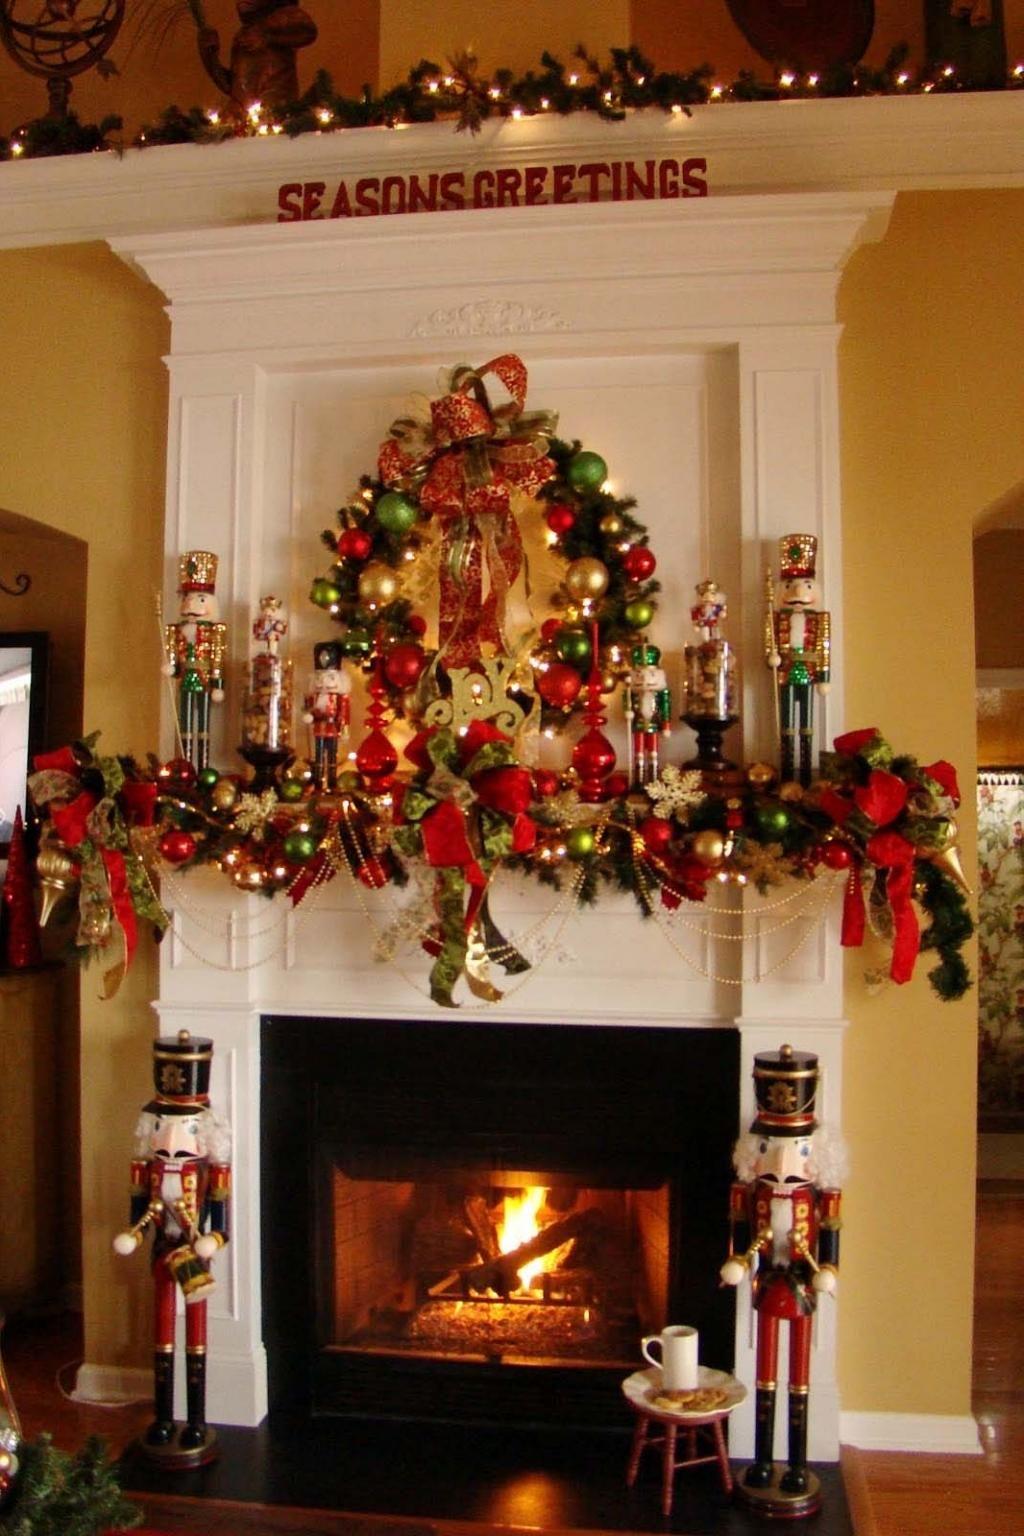 Épinglé par francie sur inspiring home ~ xmas decorations